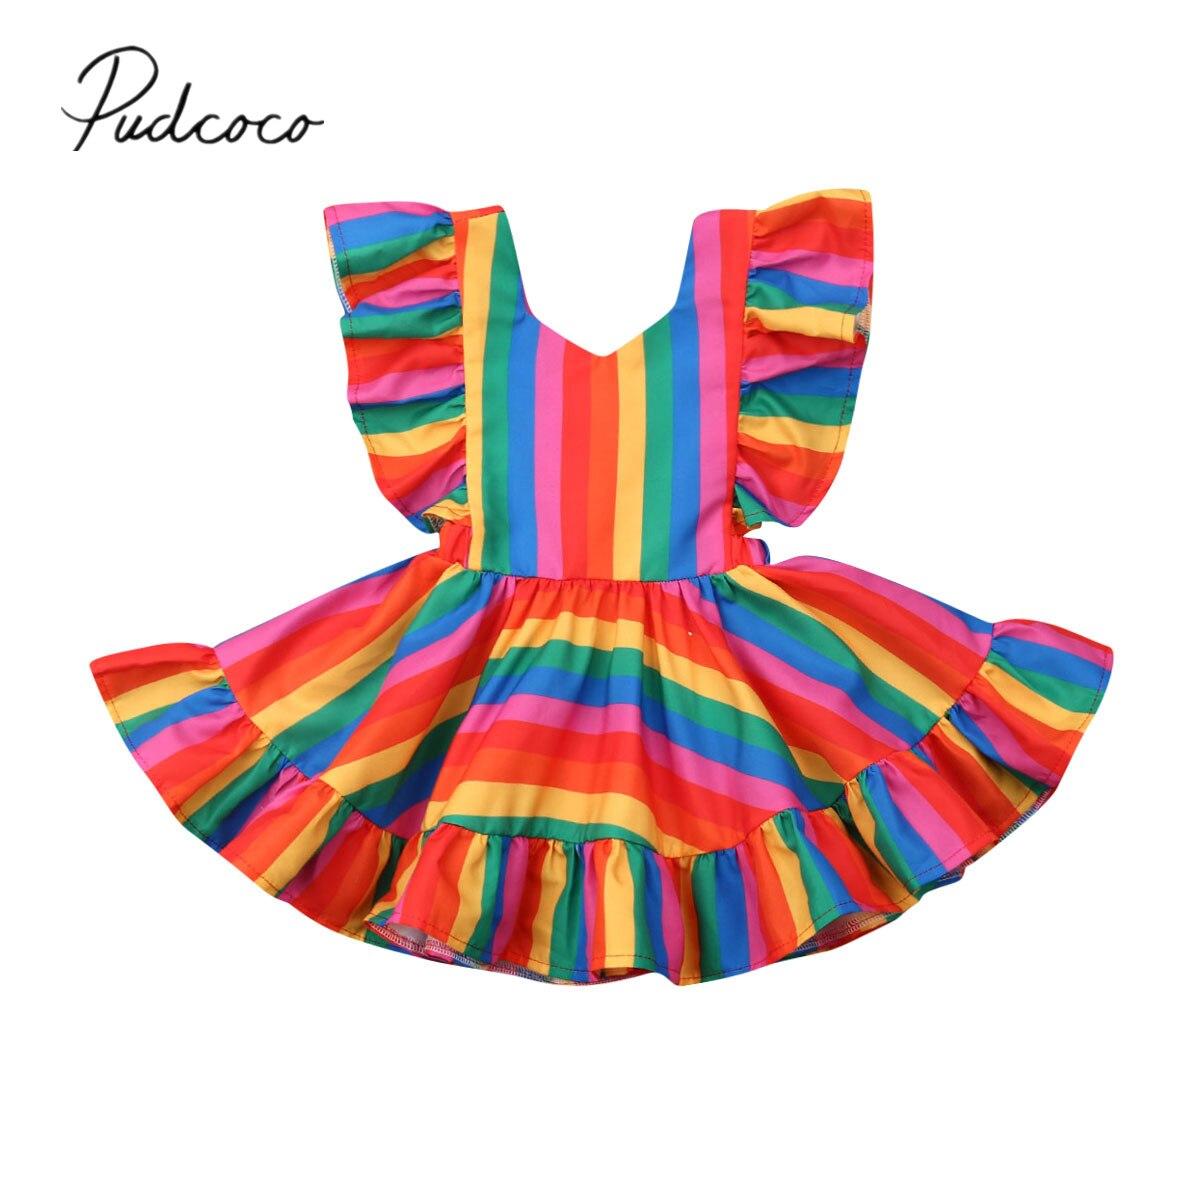 c10174467 2019 Baby Summer Clothing Kids Baby Girl Rainbow Dress Ruffle Sleeve  Striped Mini A-Line